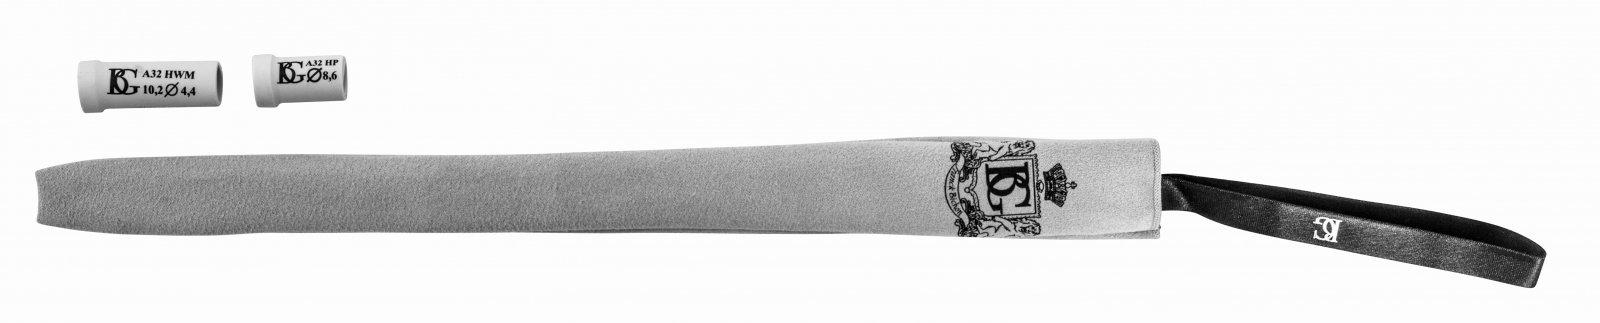 BG Flute Headjoint & Body Swab - Microfiber